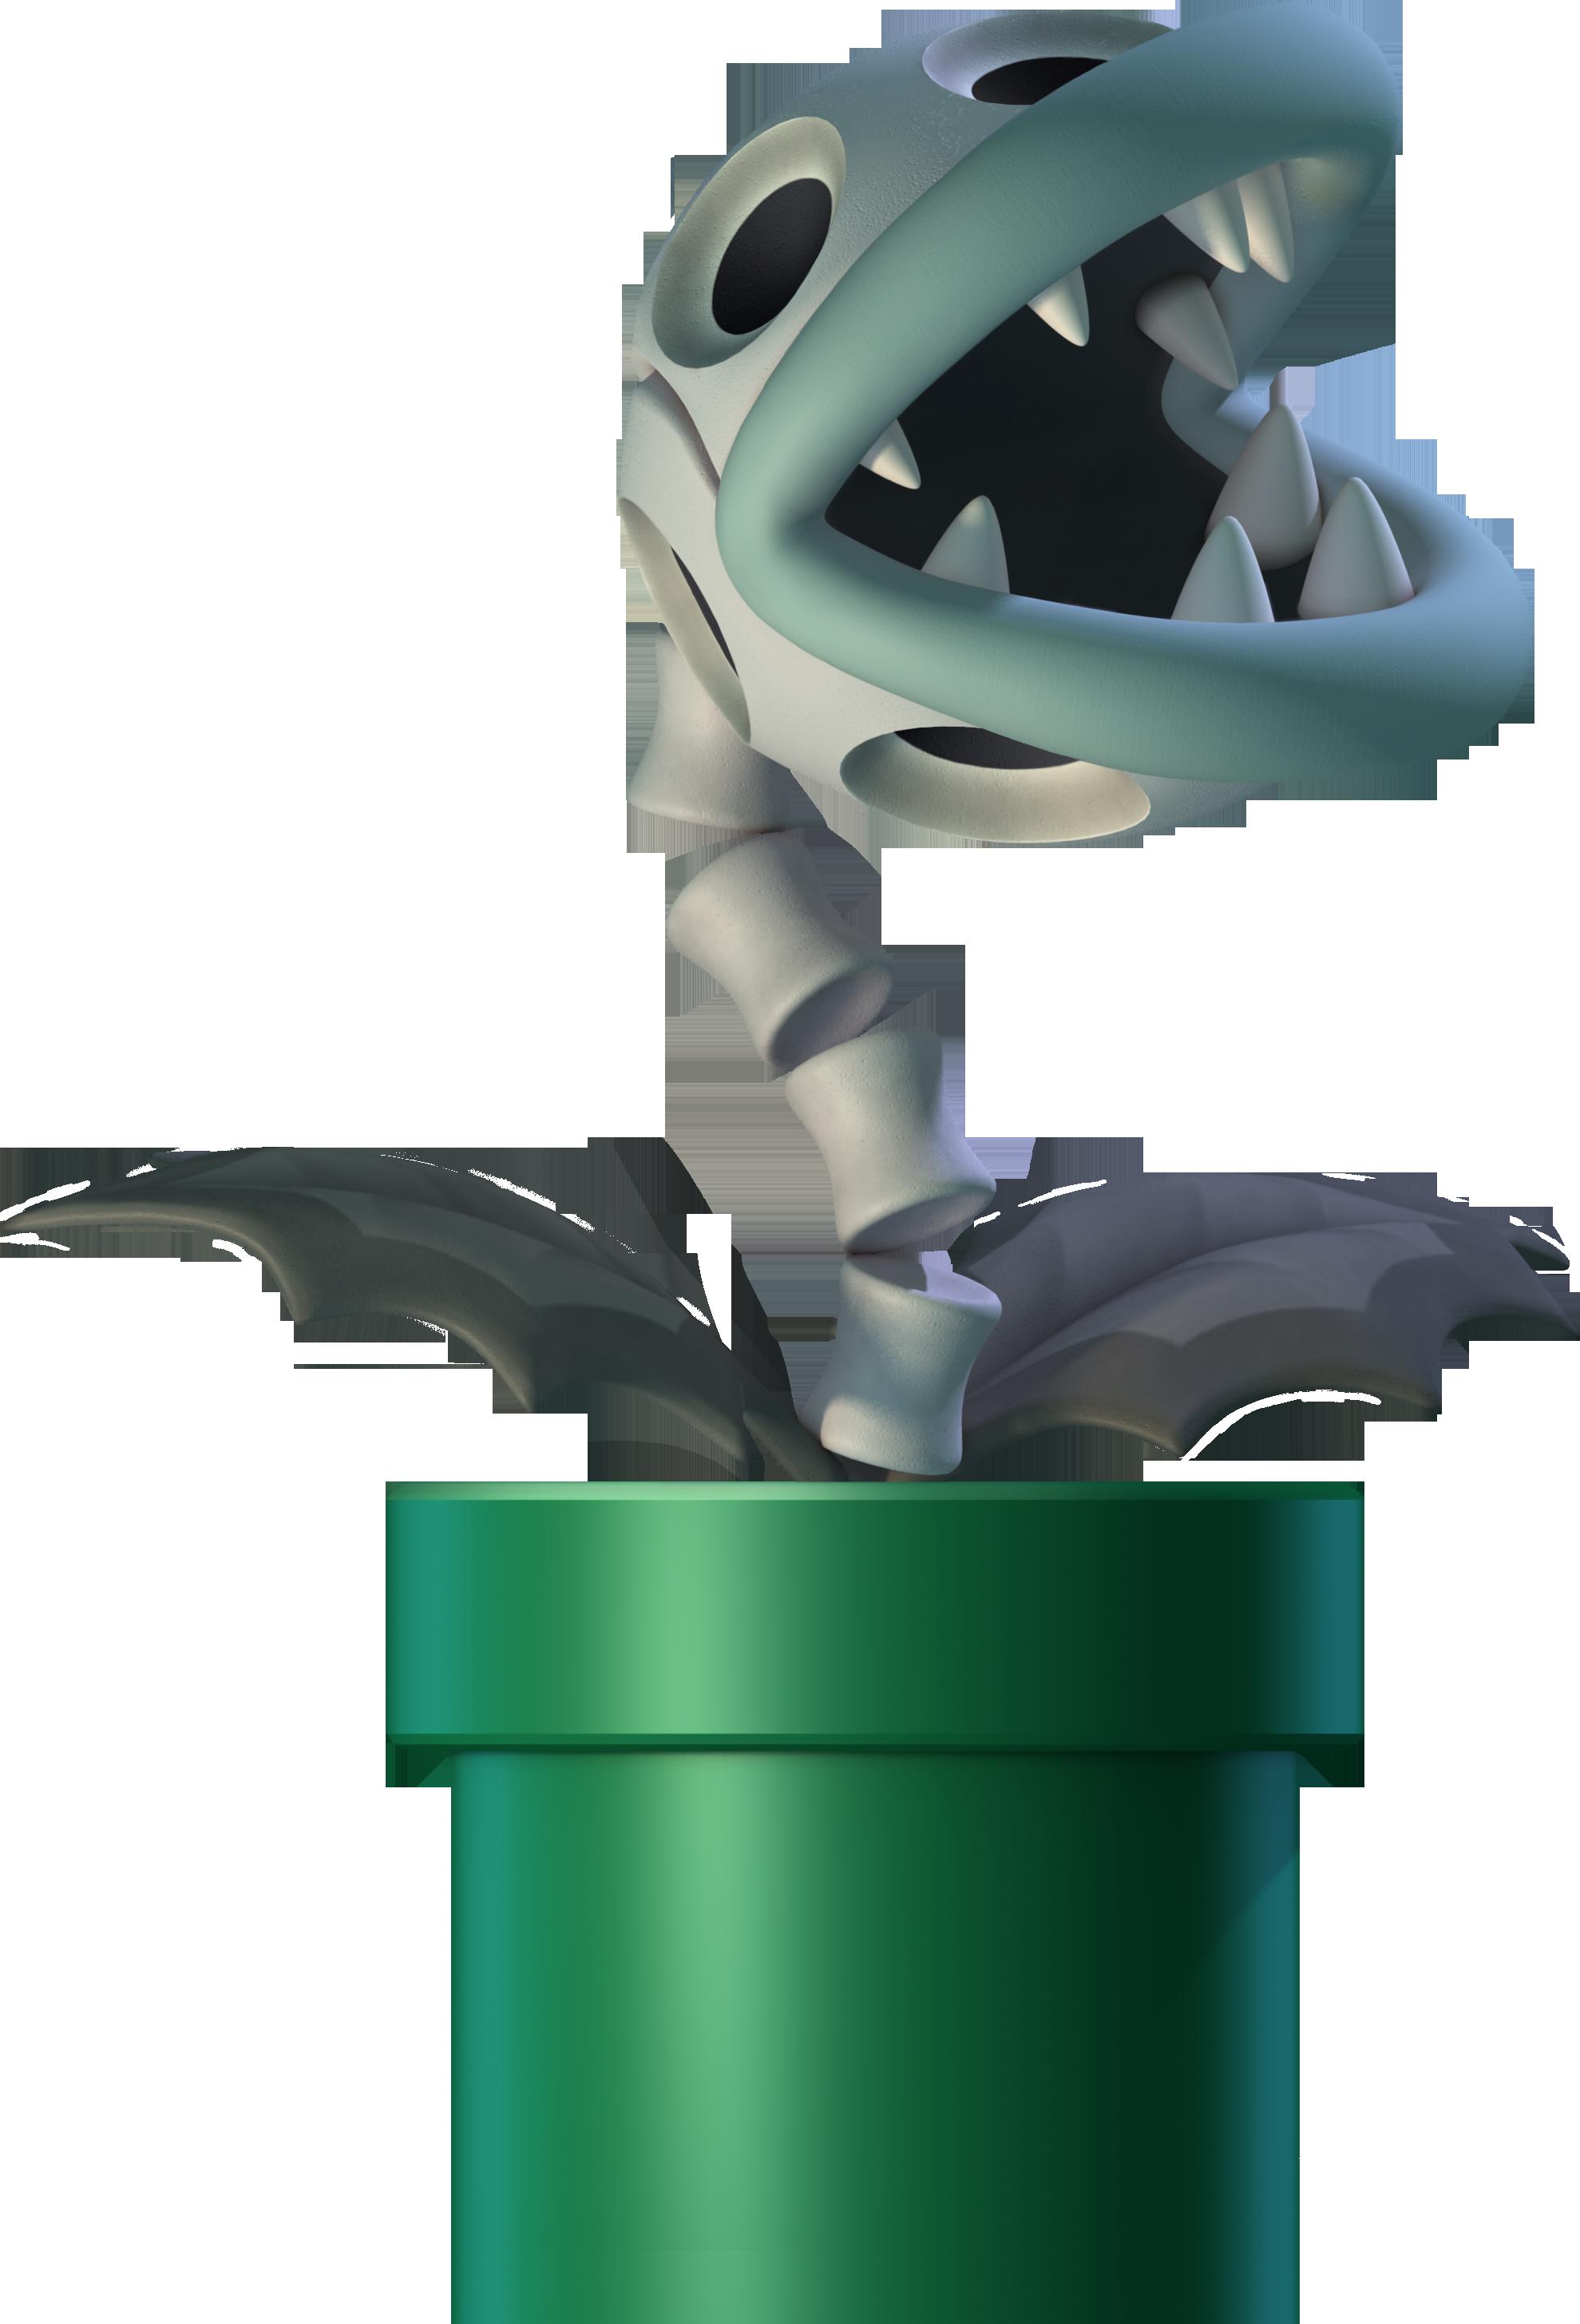 Bone Piranha Plant Nintendo Fandom Powered By Wikia